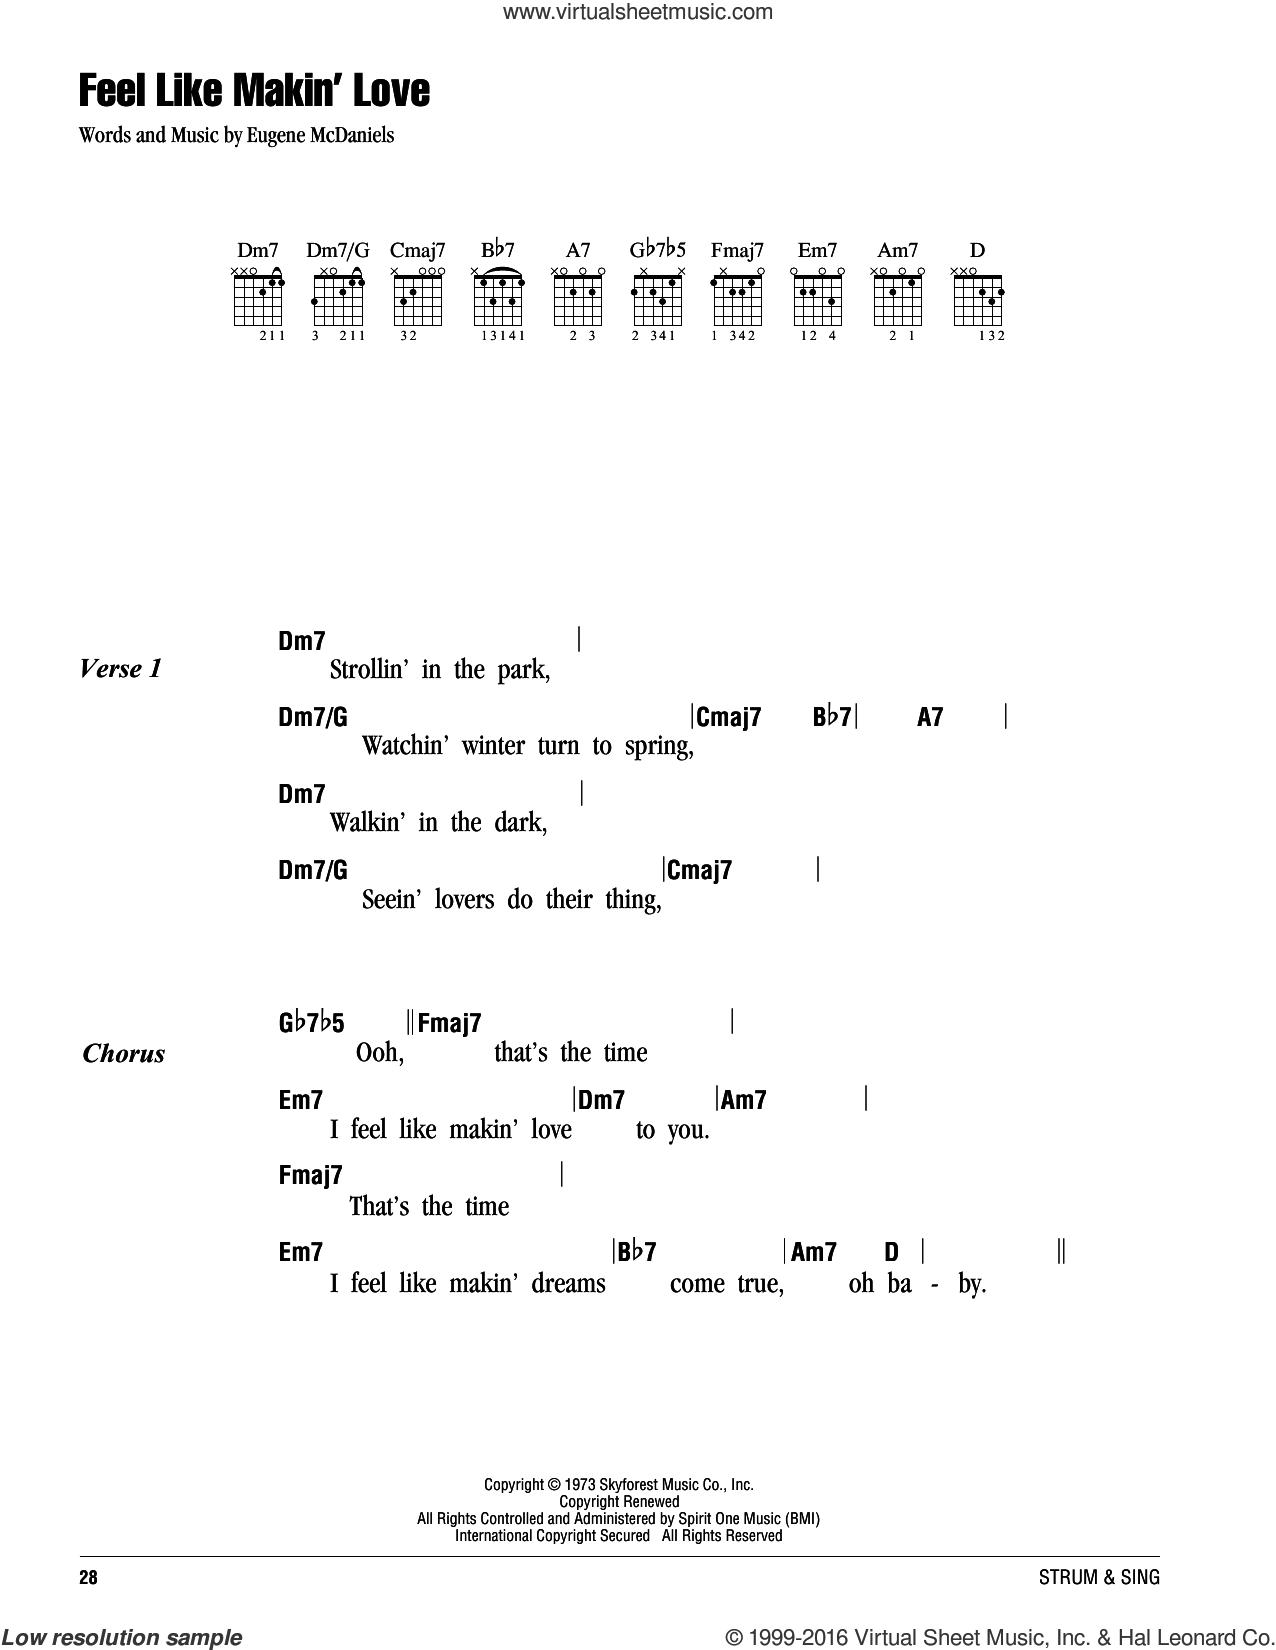 Feel Like Makin' Love sheet music for guitar (chords) by Roberta Flack and Eugene McDaniels, intermediate skill level